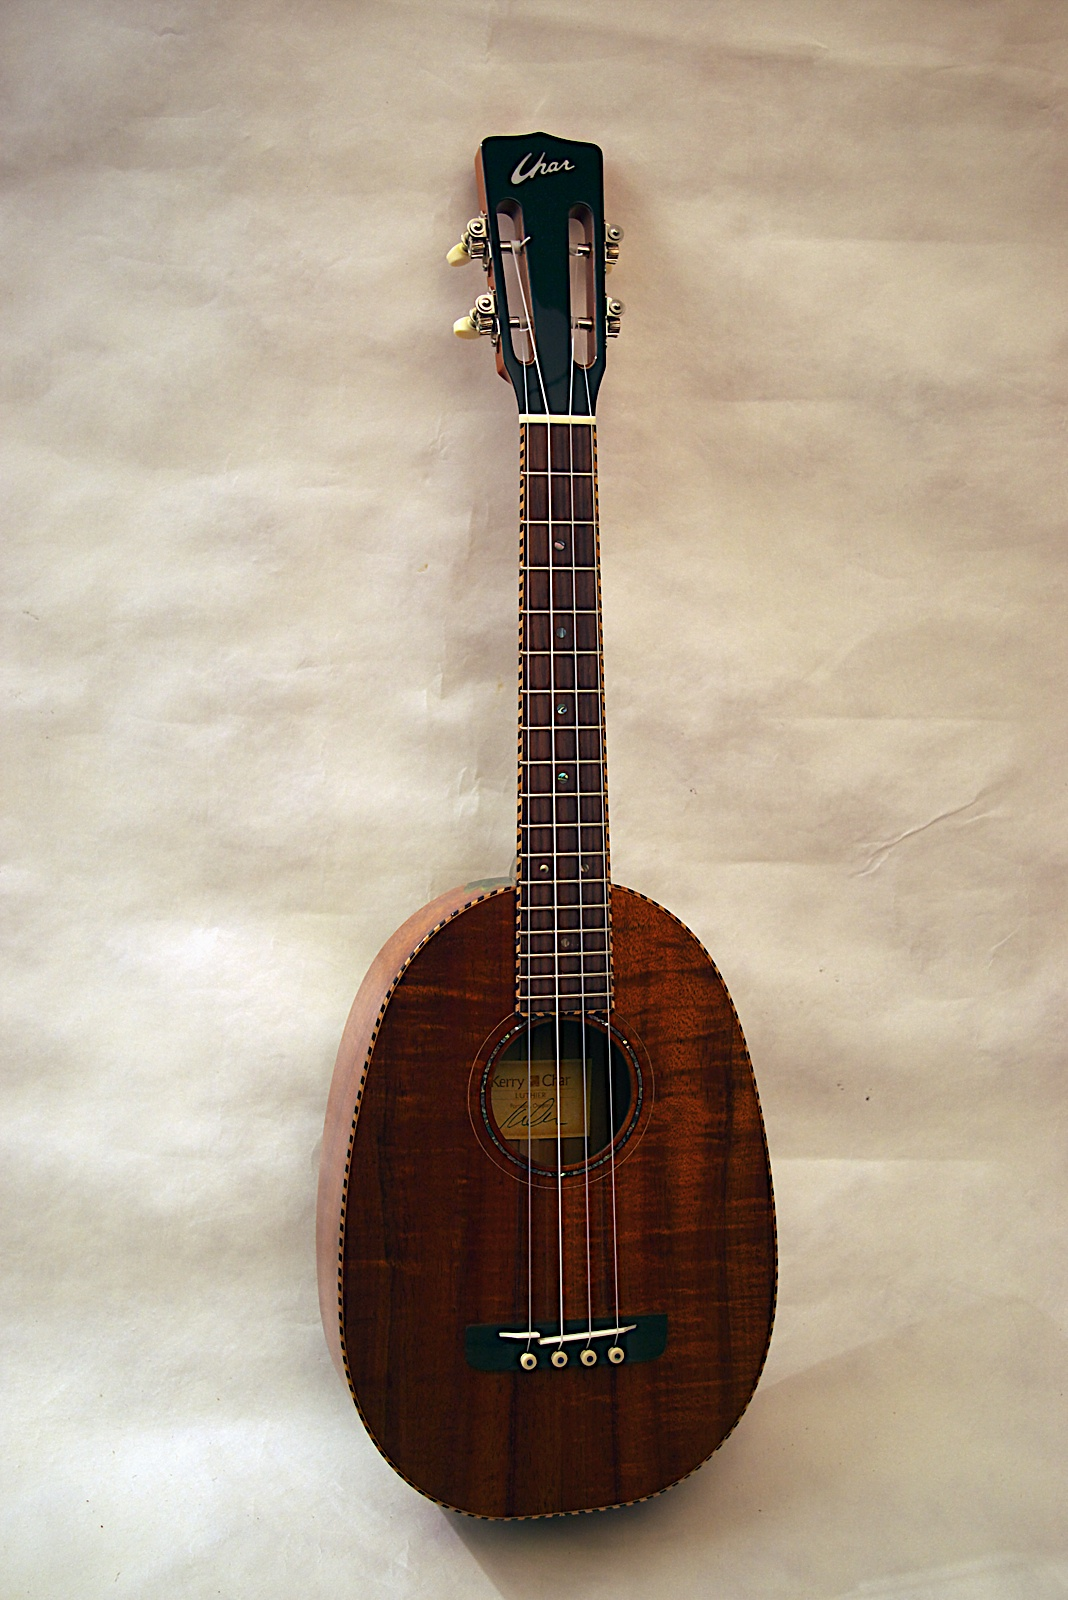 pineapple ukulele1a.jpg